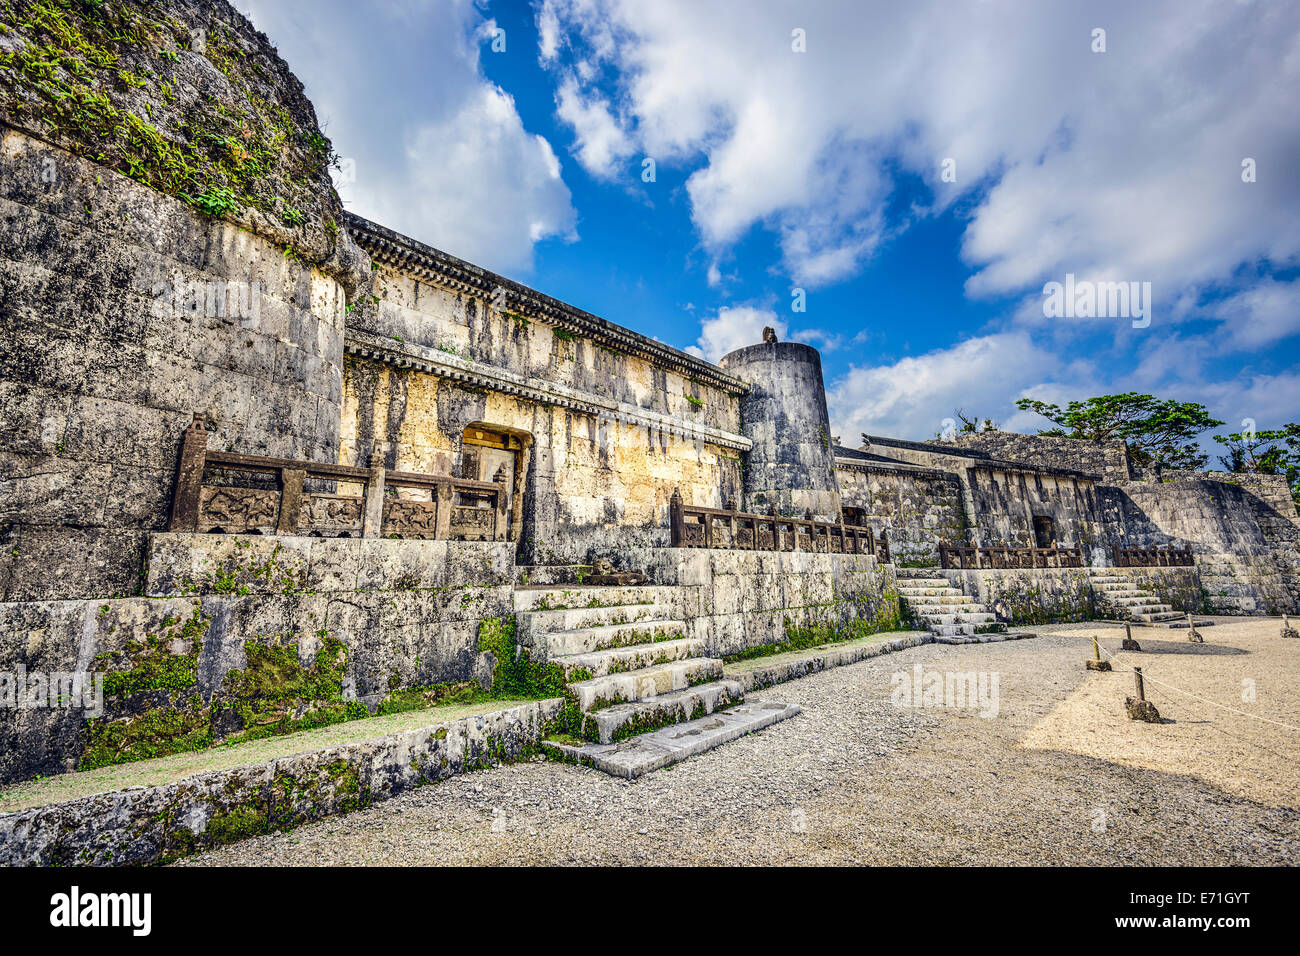 Tamaudun Mausoleum in Okinawa, Japan. The remains of 18 Ryuku kings and their families are entombed at Tamaudun. - Stock Image